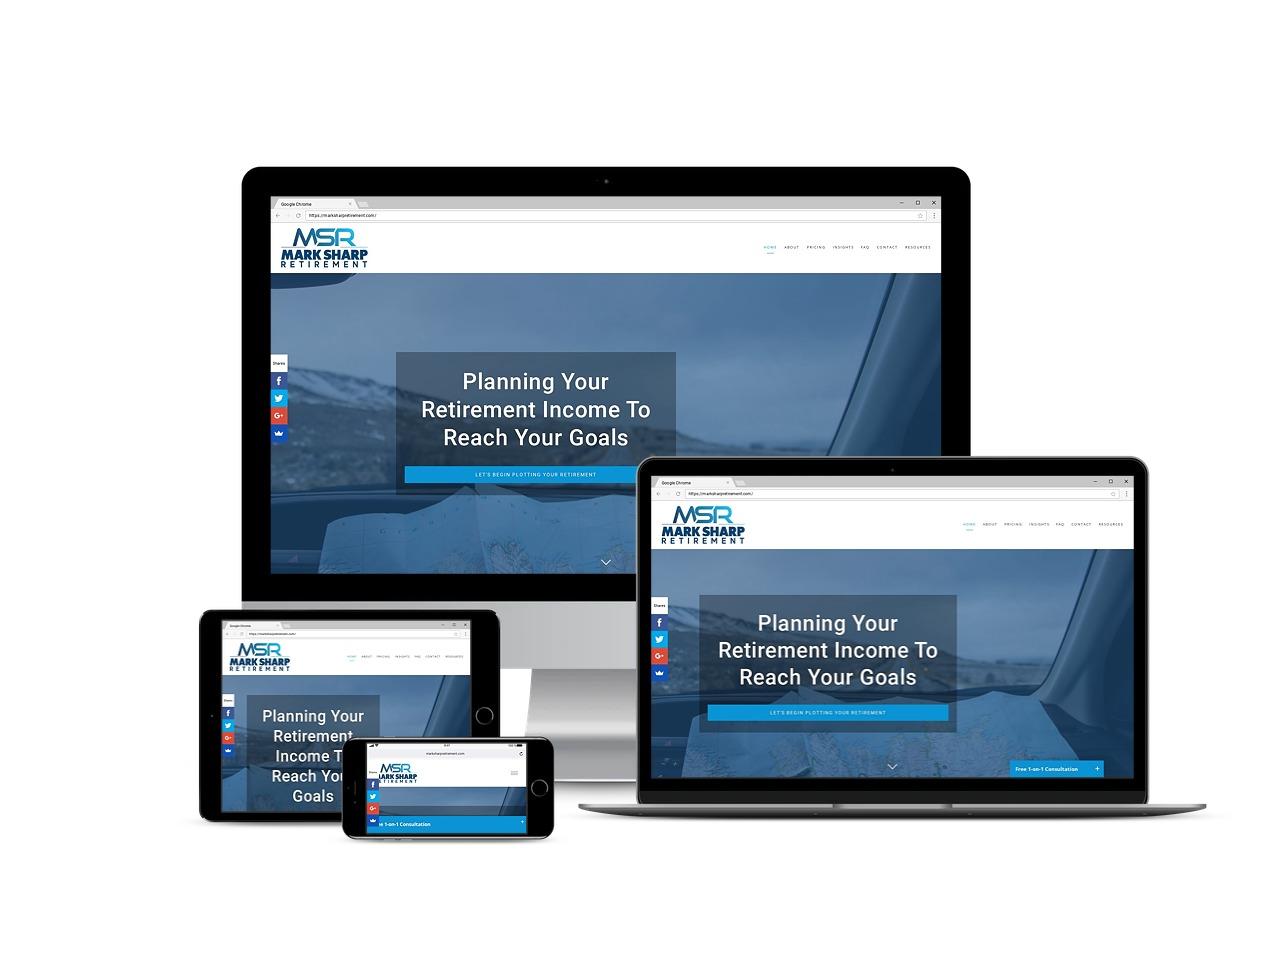 mark sharp retirement poc people of color financial advisor website